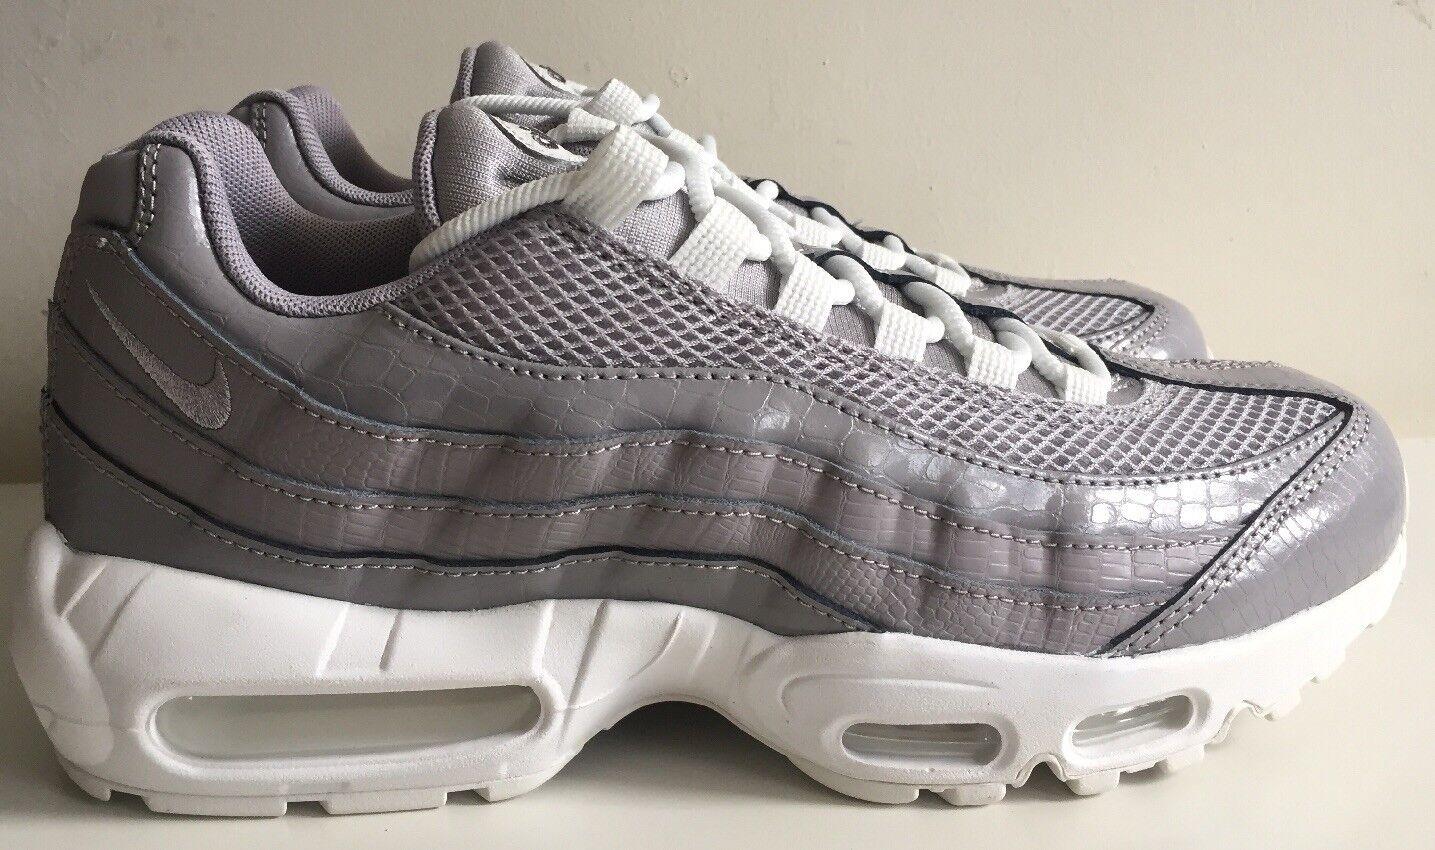 Nike Air Max 95 PRM Wmns Wmns Wmns Talla 7 Reino Unido 41 EUR gris blancoo 807443 015  la mejor oferta de tienda online